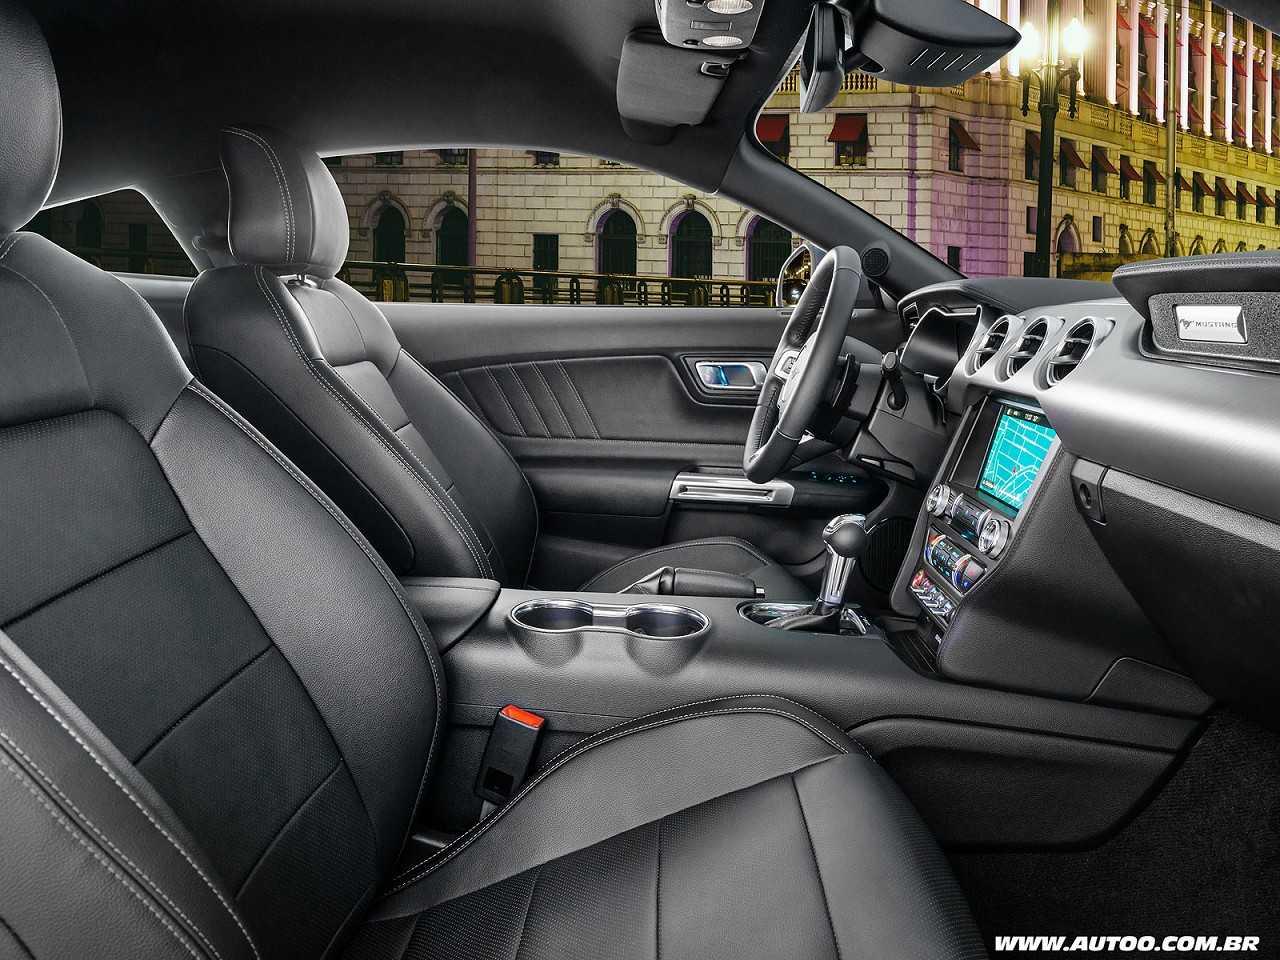 FordMustang 2018 - bancos dianteiros